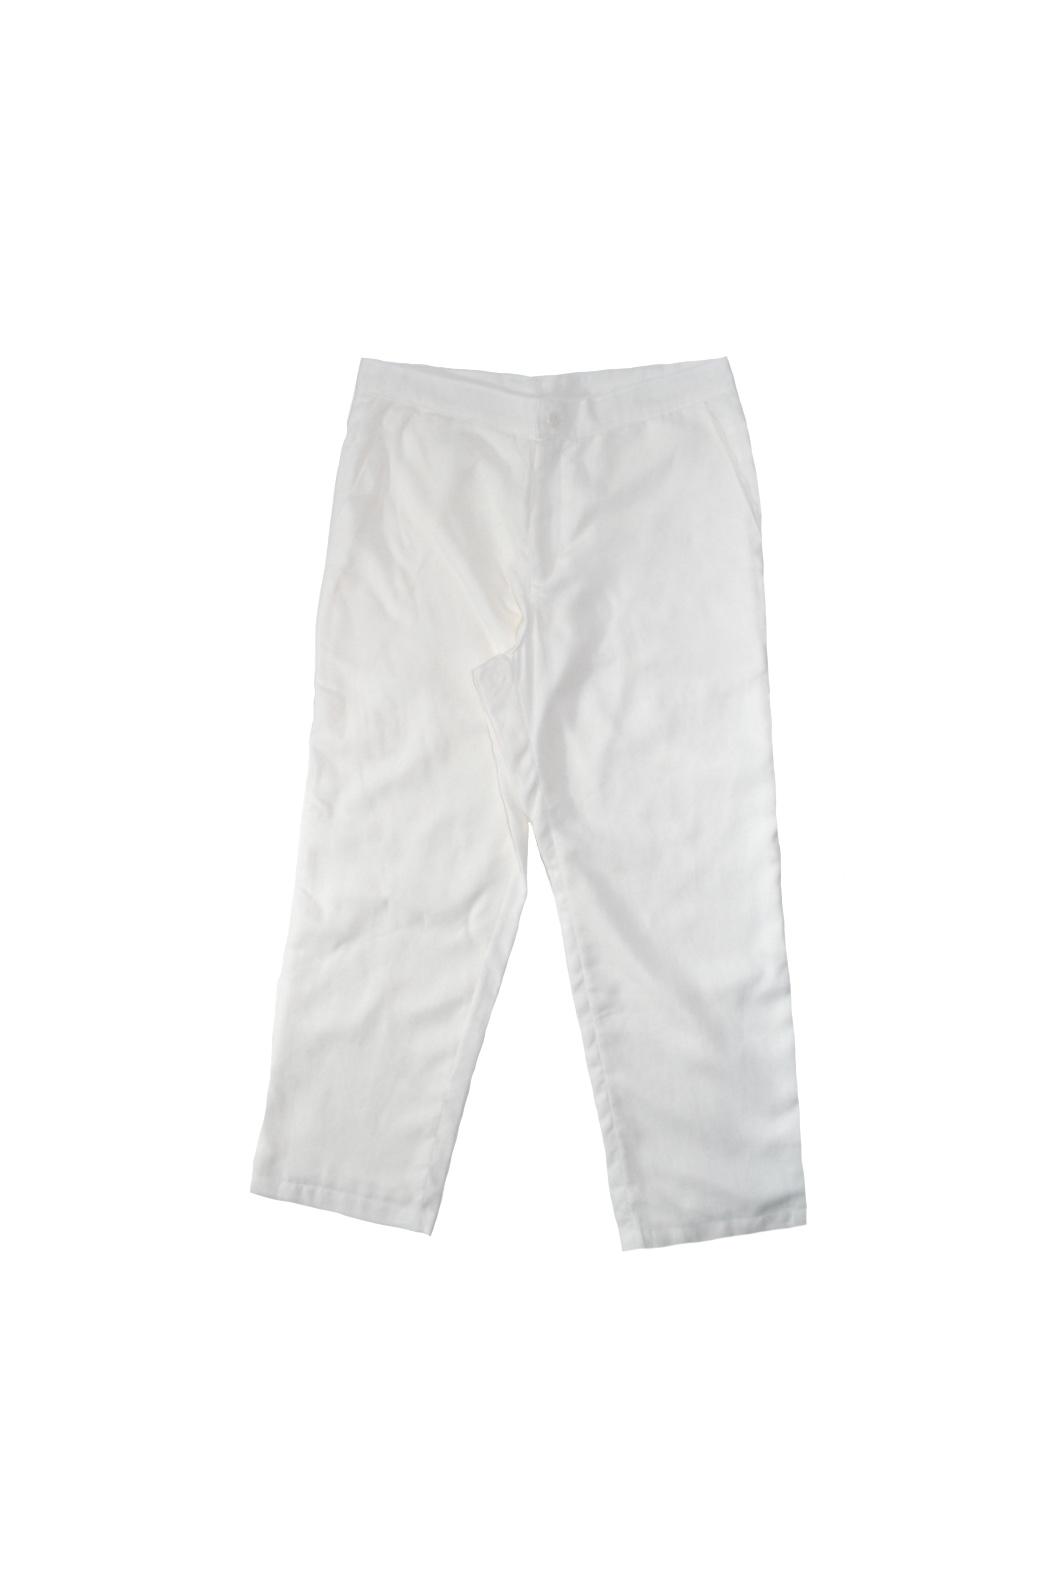 Calça Cacimba Branca